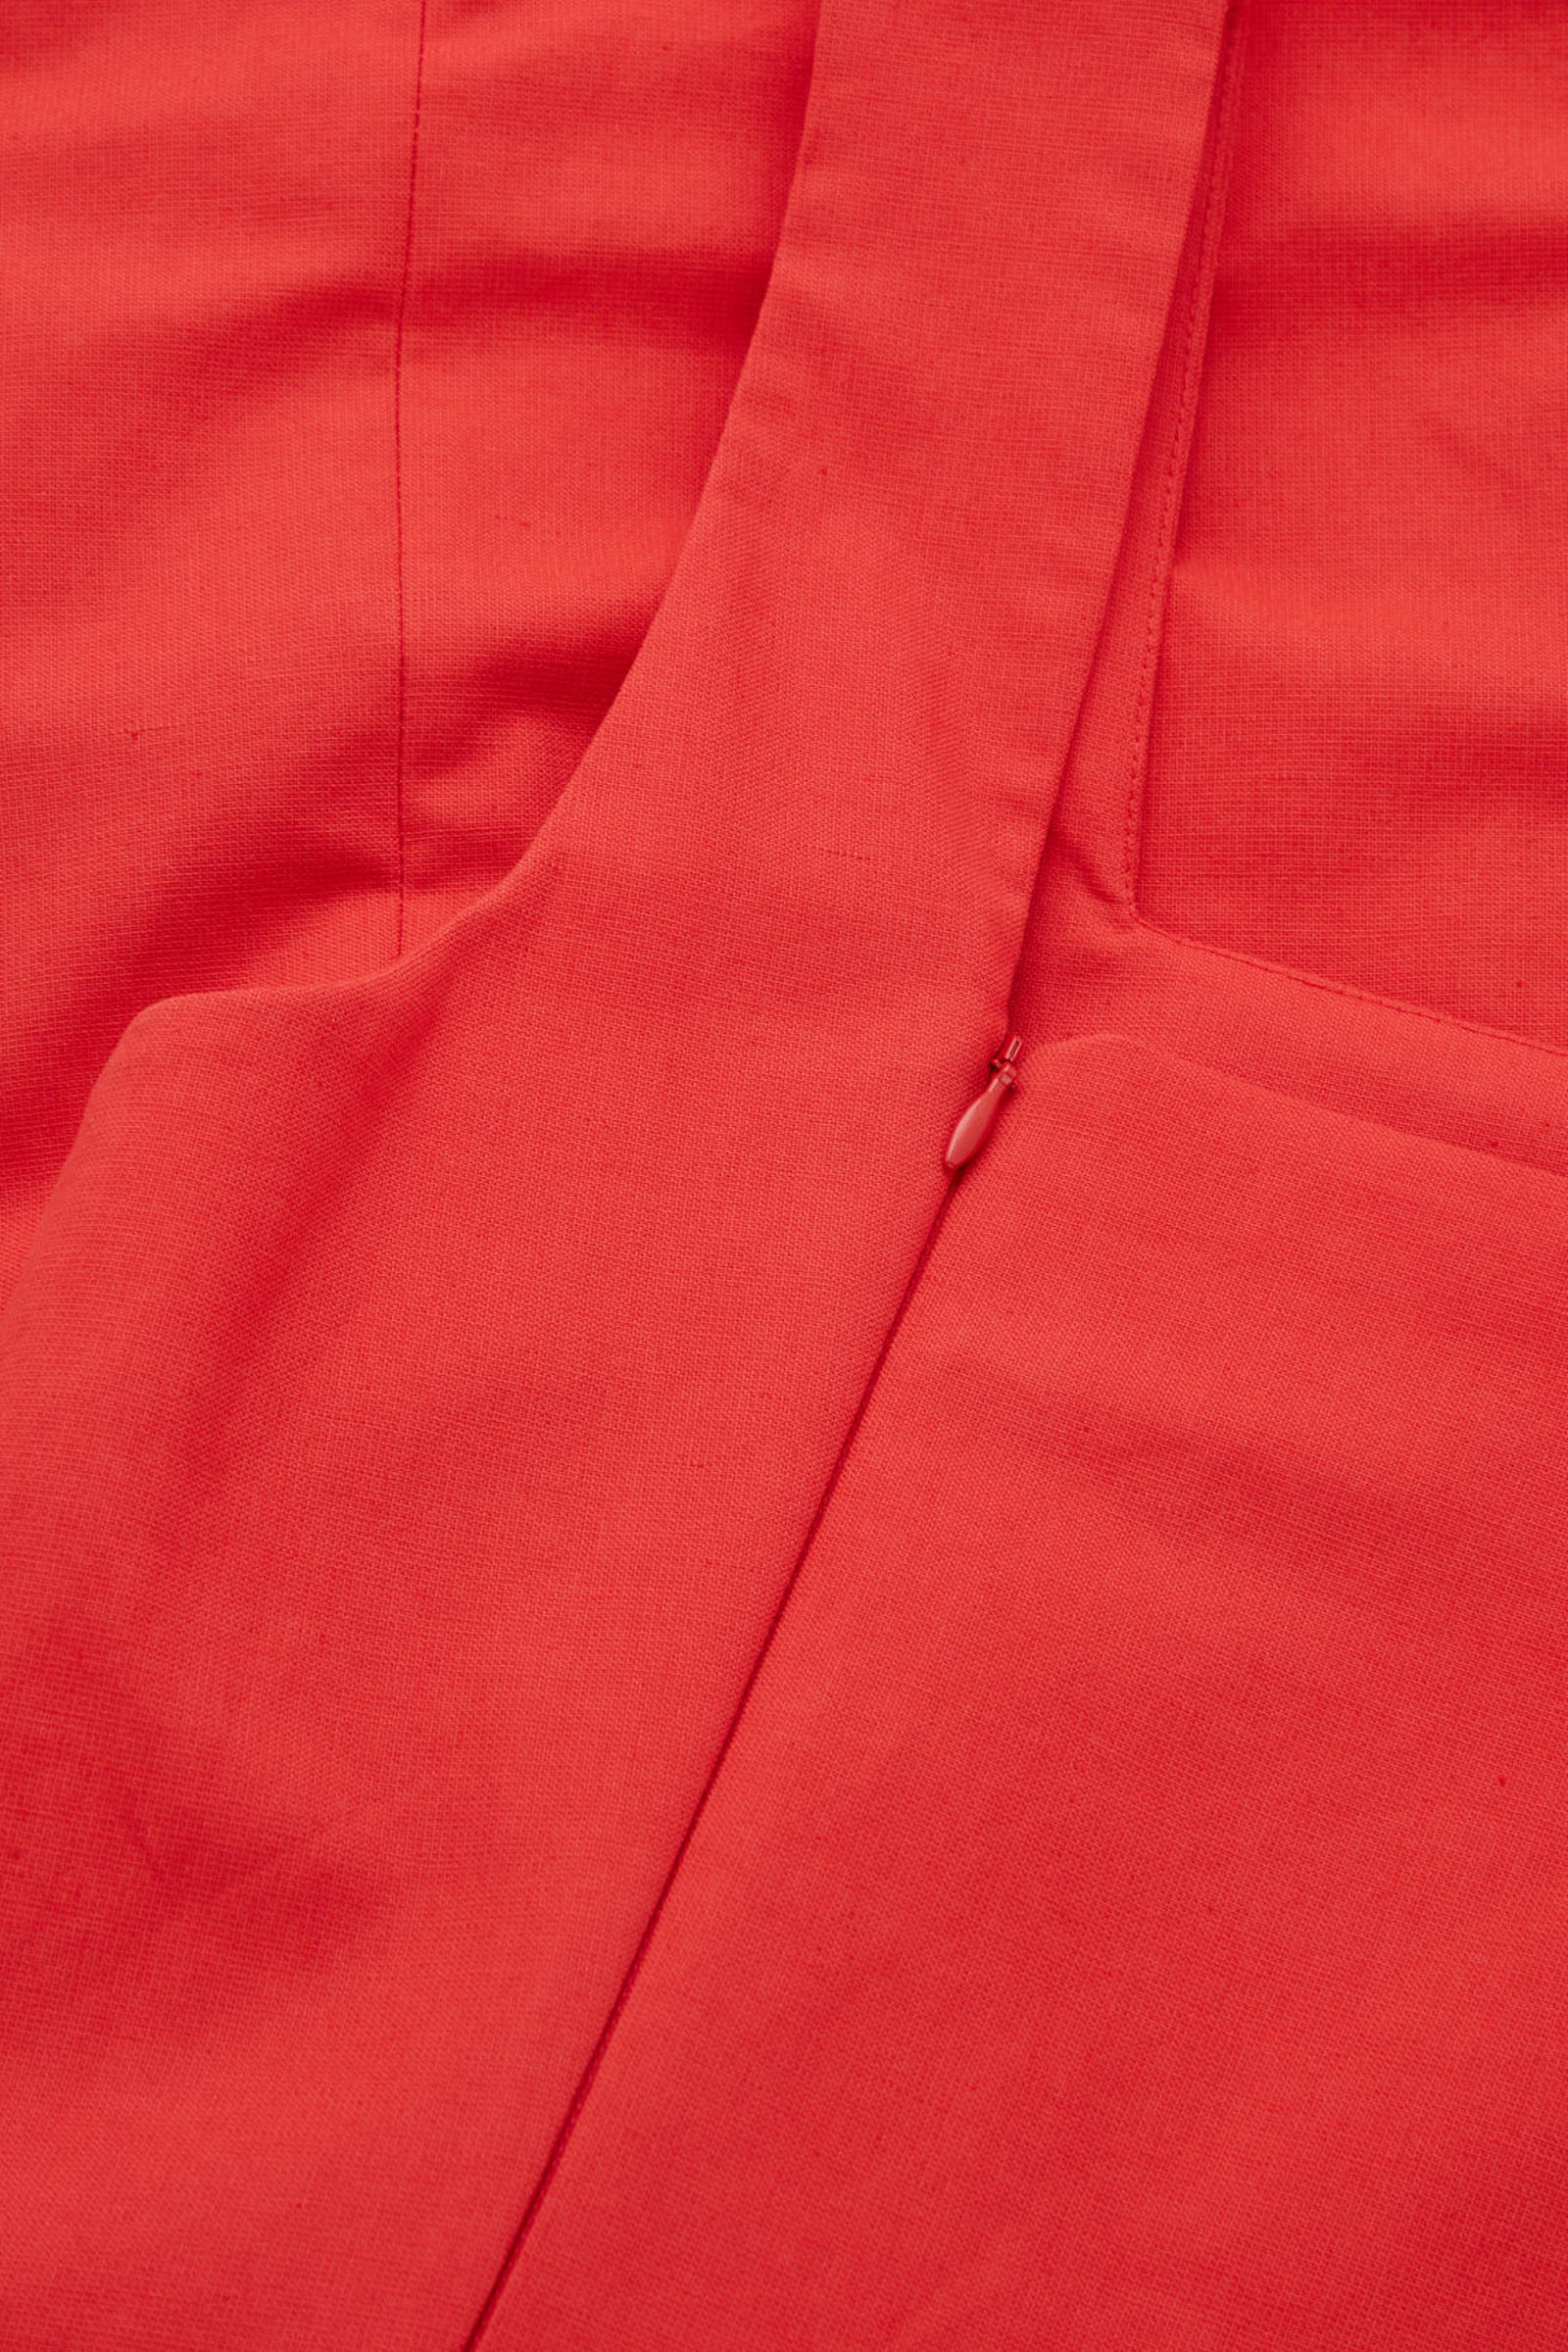 COS 슬림핏 코튼 리넨 드레스의 레드컬러 Detail입니다.